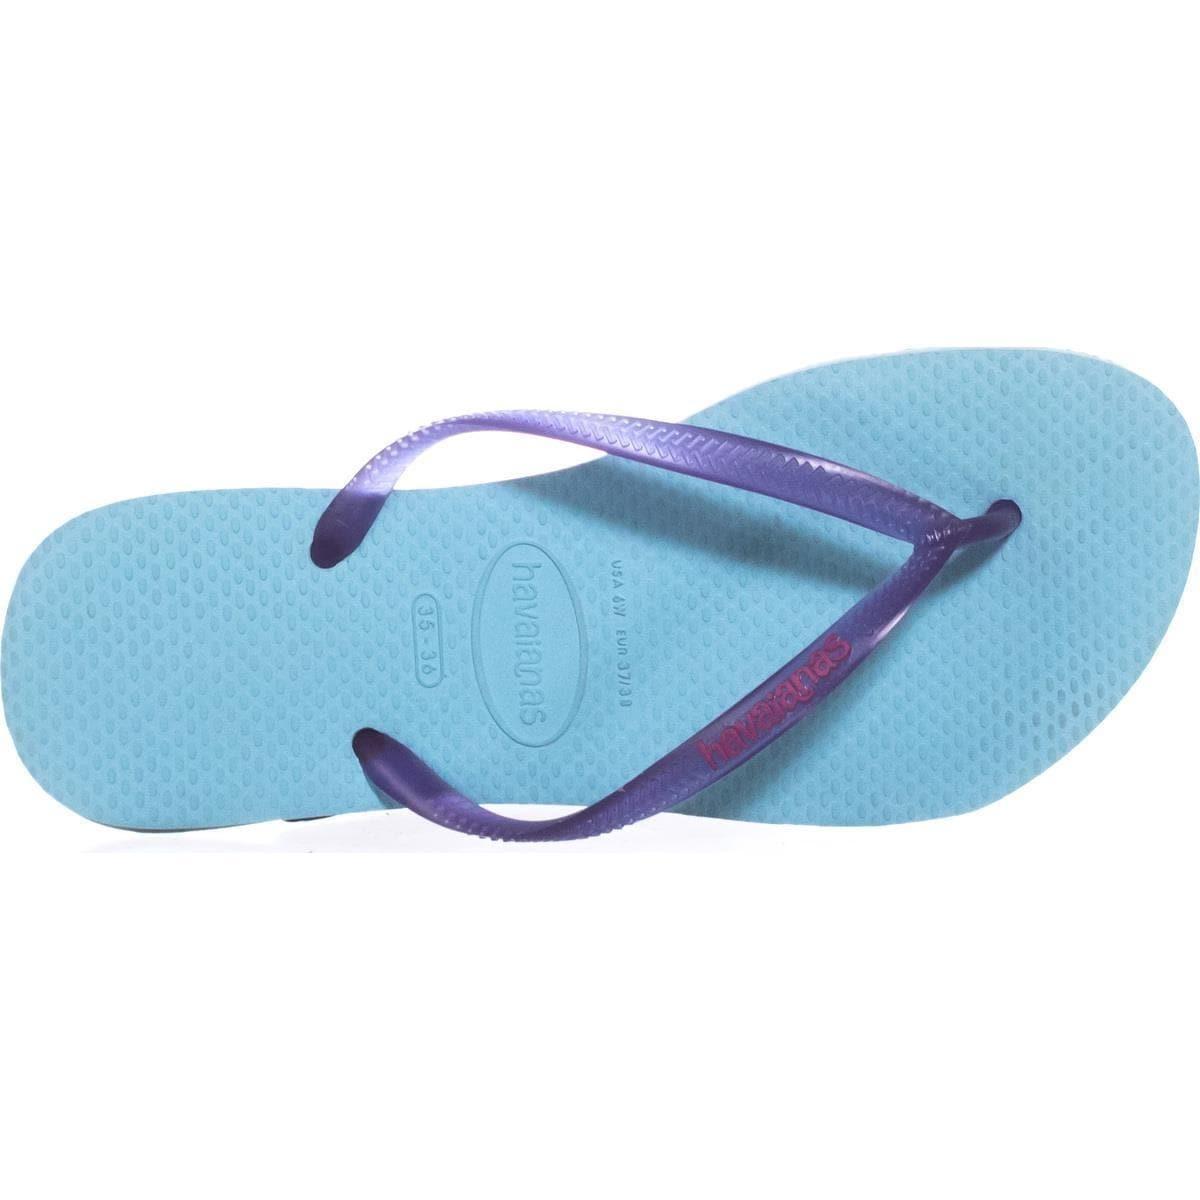 75f8c2b44 Shop Havaianas Slim Logo Pop Up Two-Tone Flip Flops